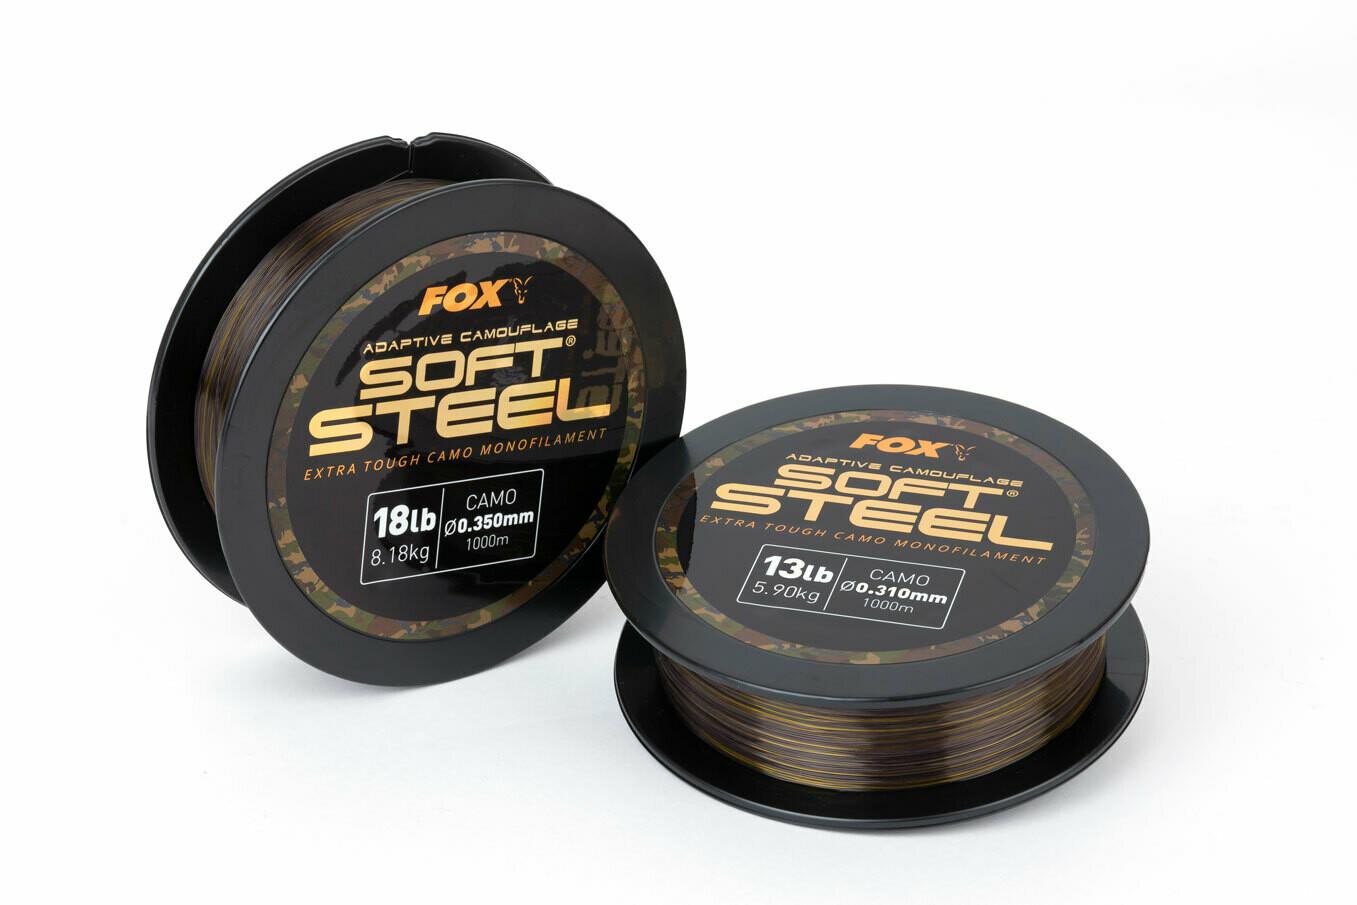 Soft steel 23lbs